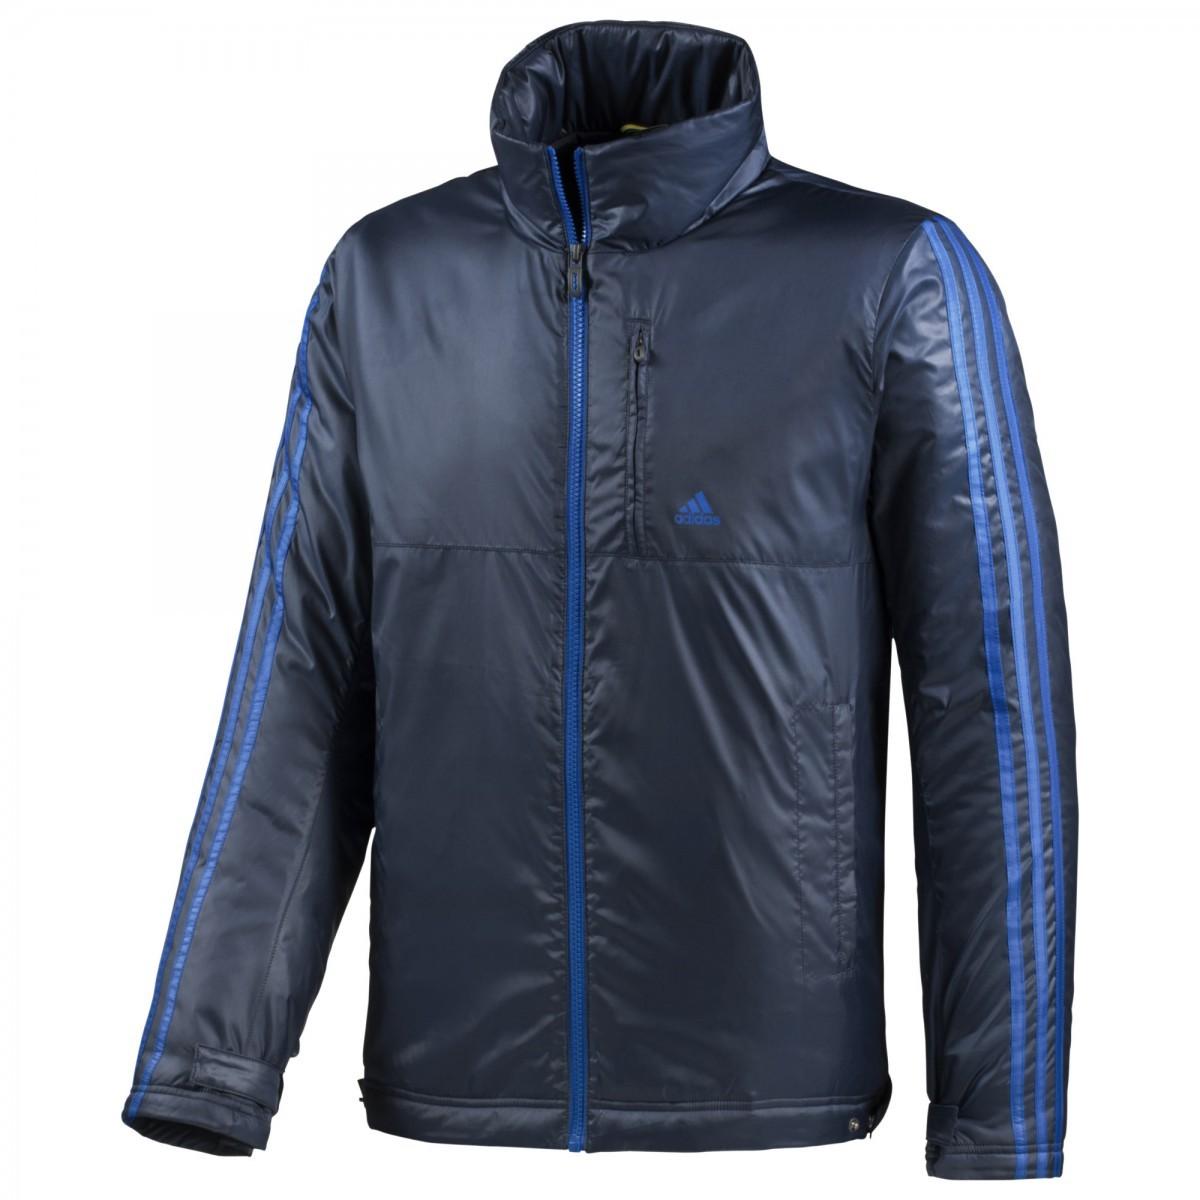 ebb9715226 ... 210253f9d47 Bizz Store - Jaqueta Masculina Adidas P 3S Fibra  Impermeável ...